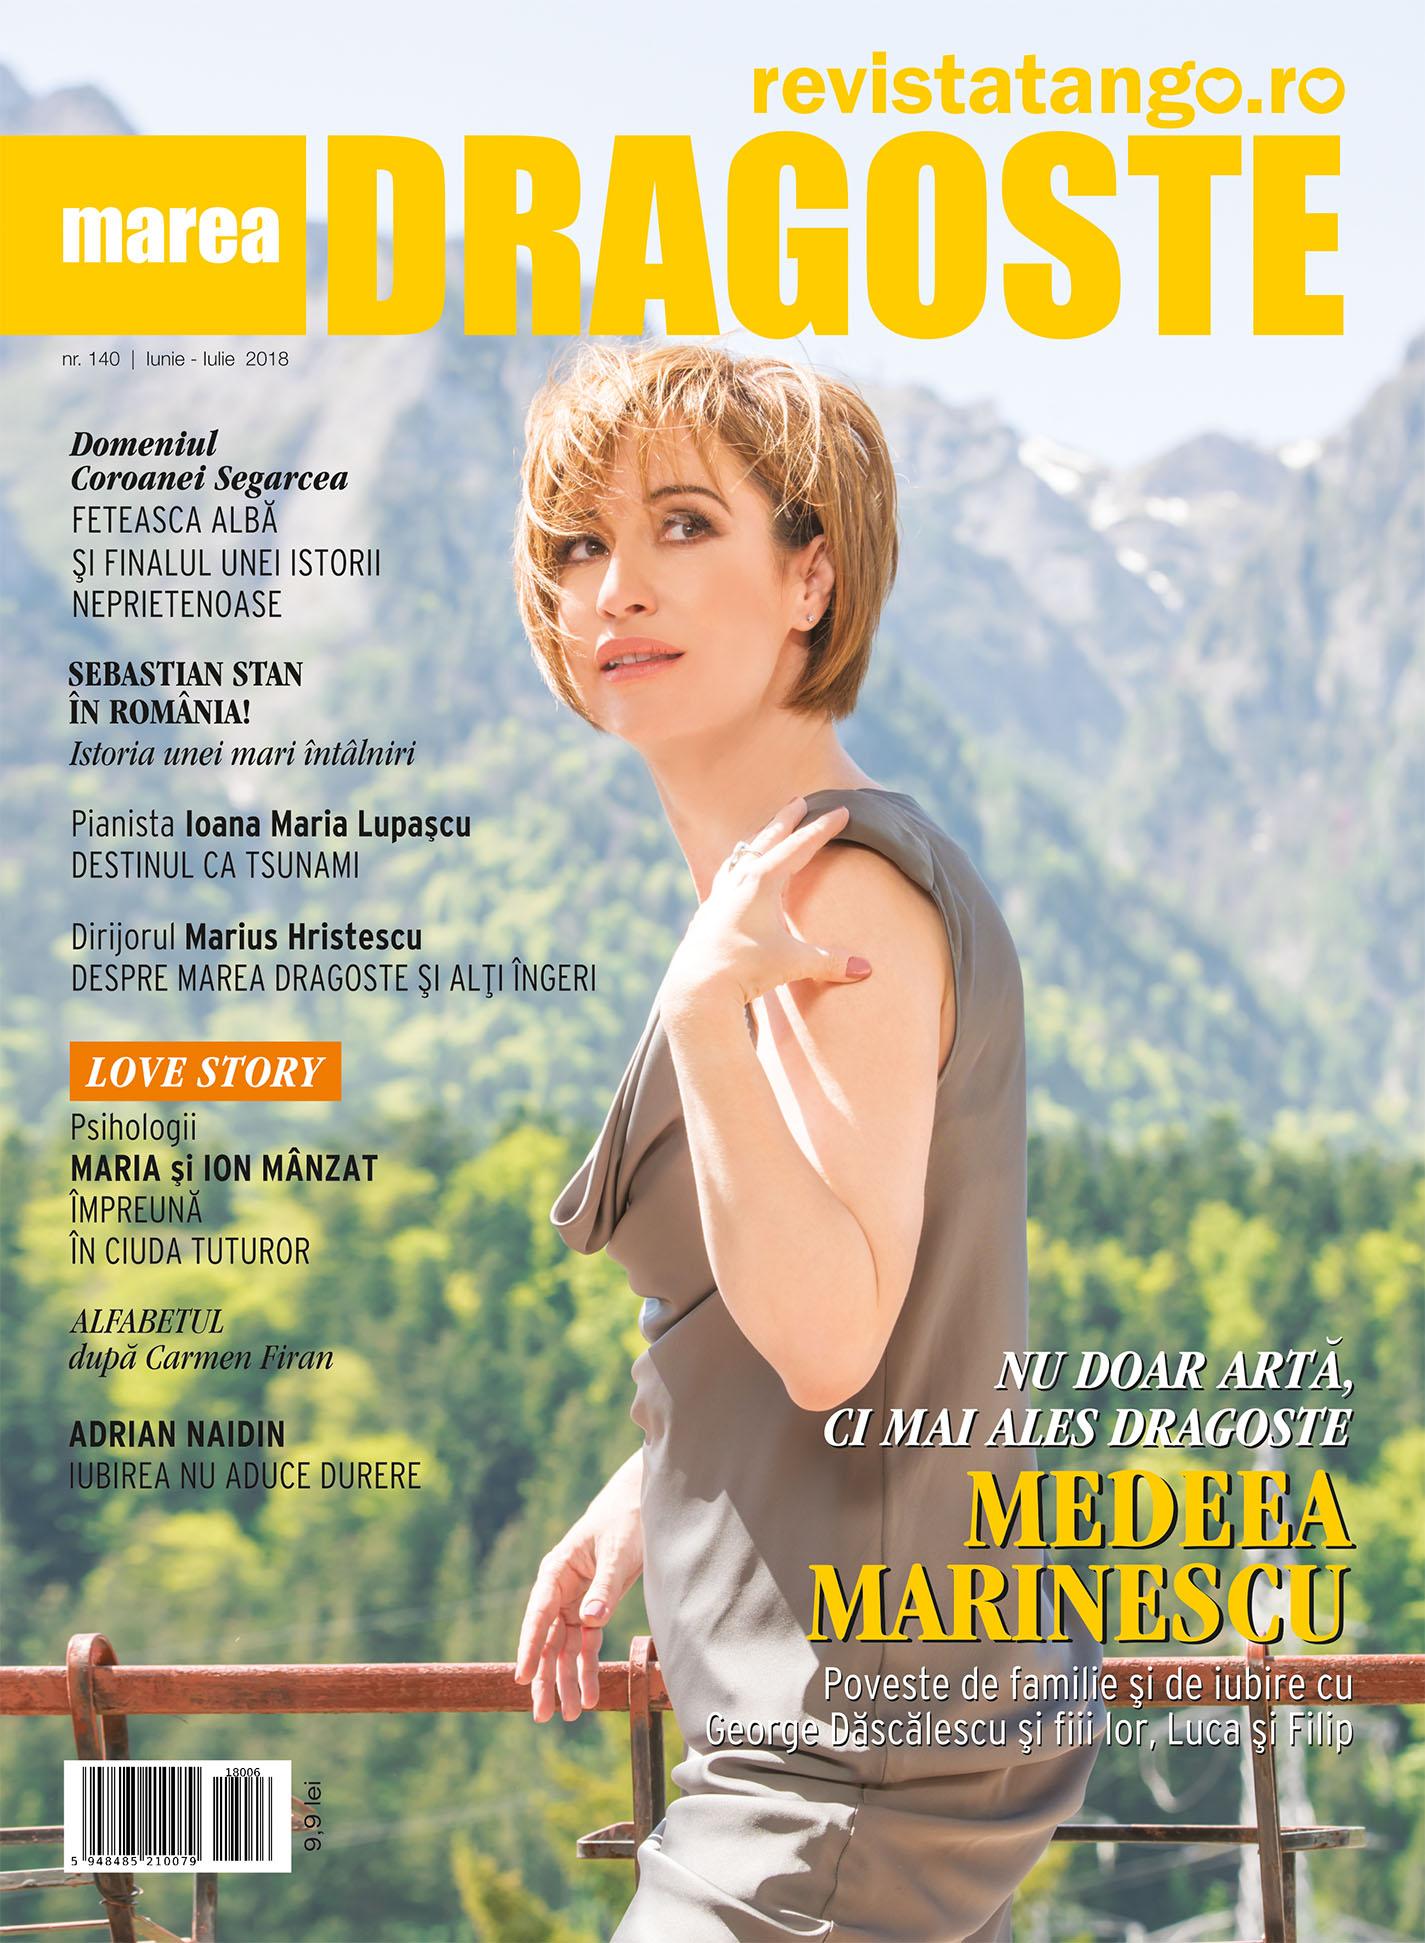 Medeea Marinescu pe coperta Marea Dragoste-revistatango.ro, nr. 140, iunie-iulie 2018